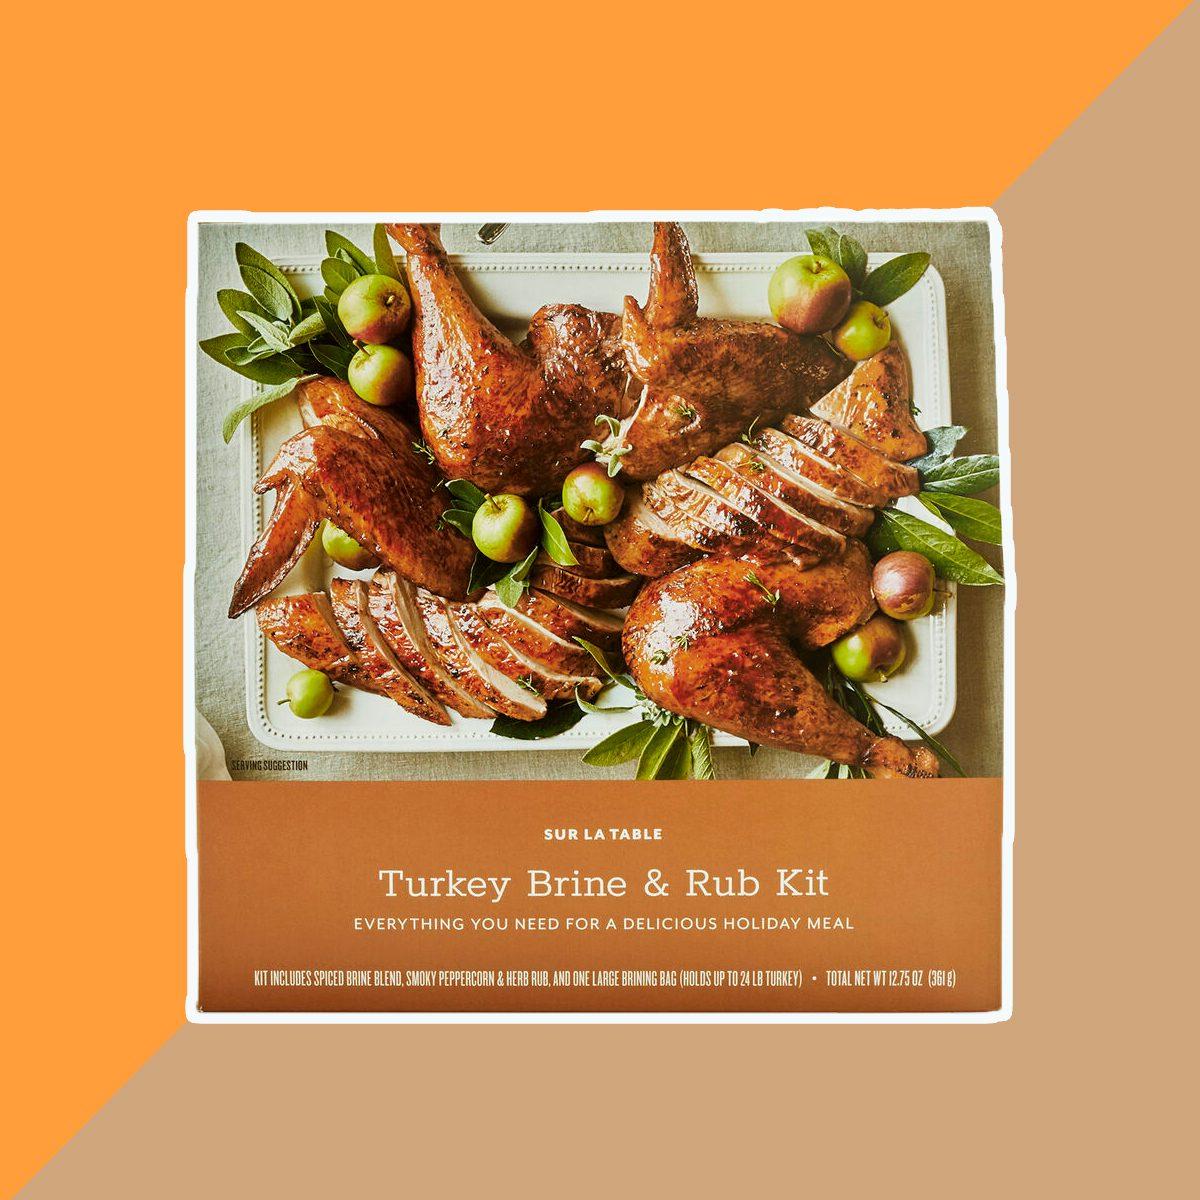 turkeybrinerubkit sur la table, thanksgiving dinner products